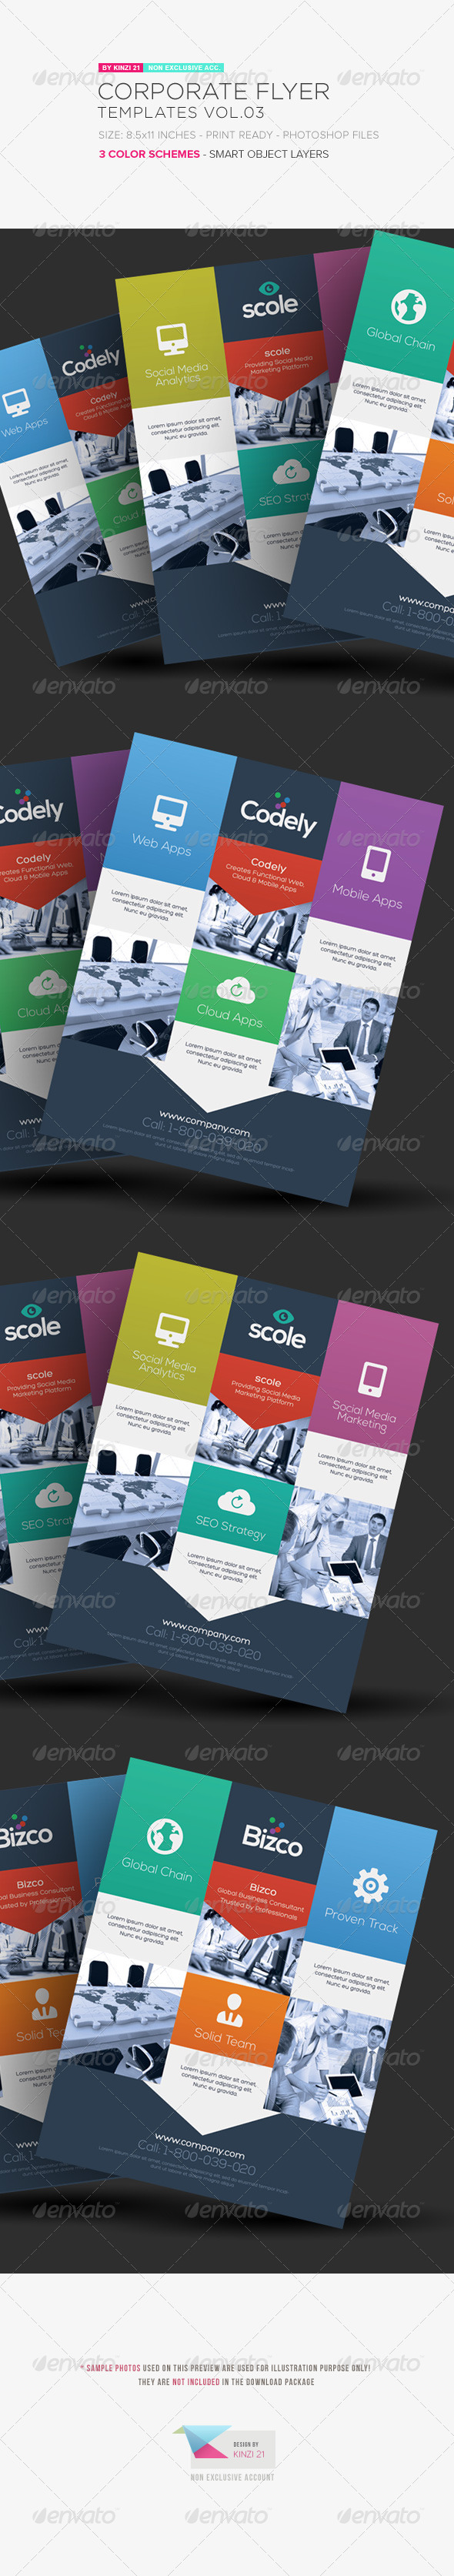 GraphicRiver Corporate Flyer Templates Vol.03 5983582